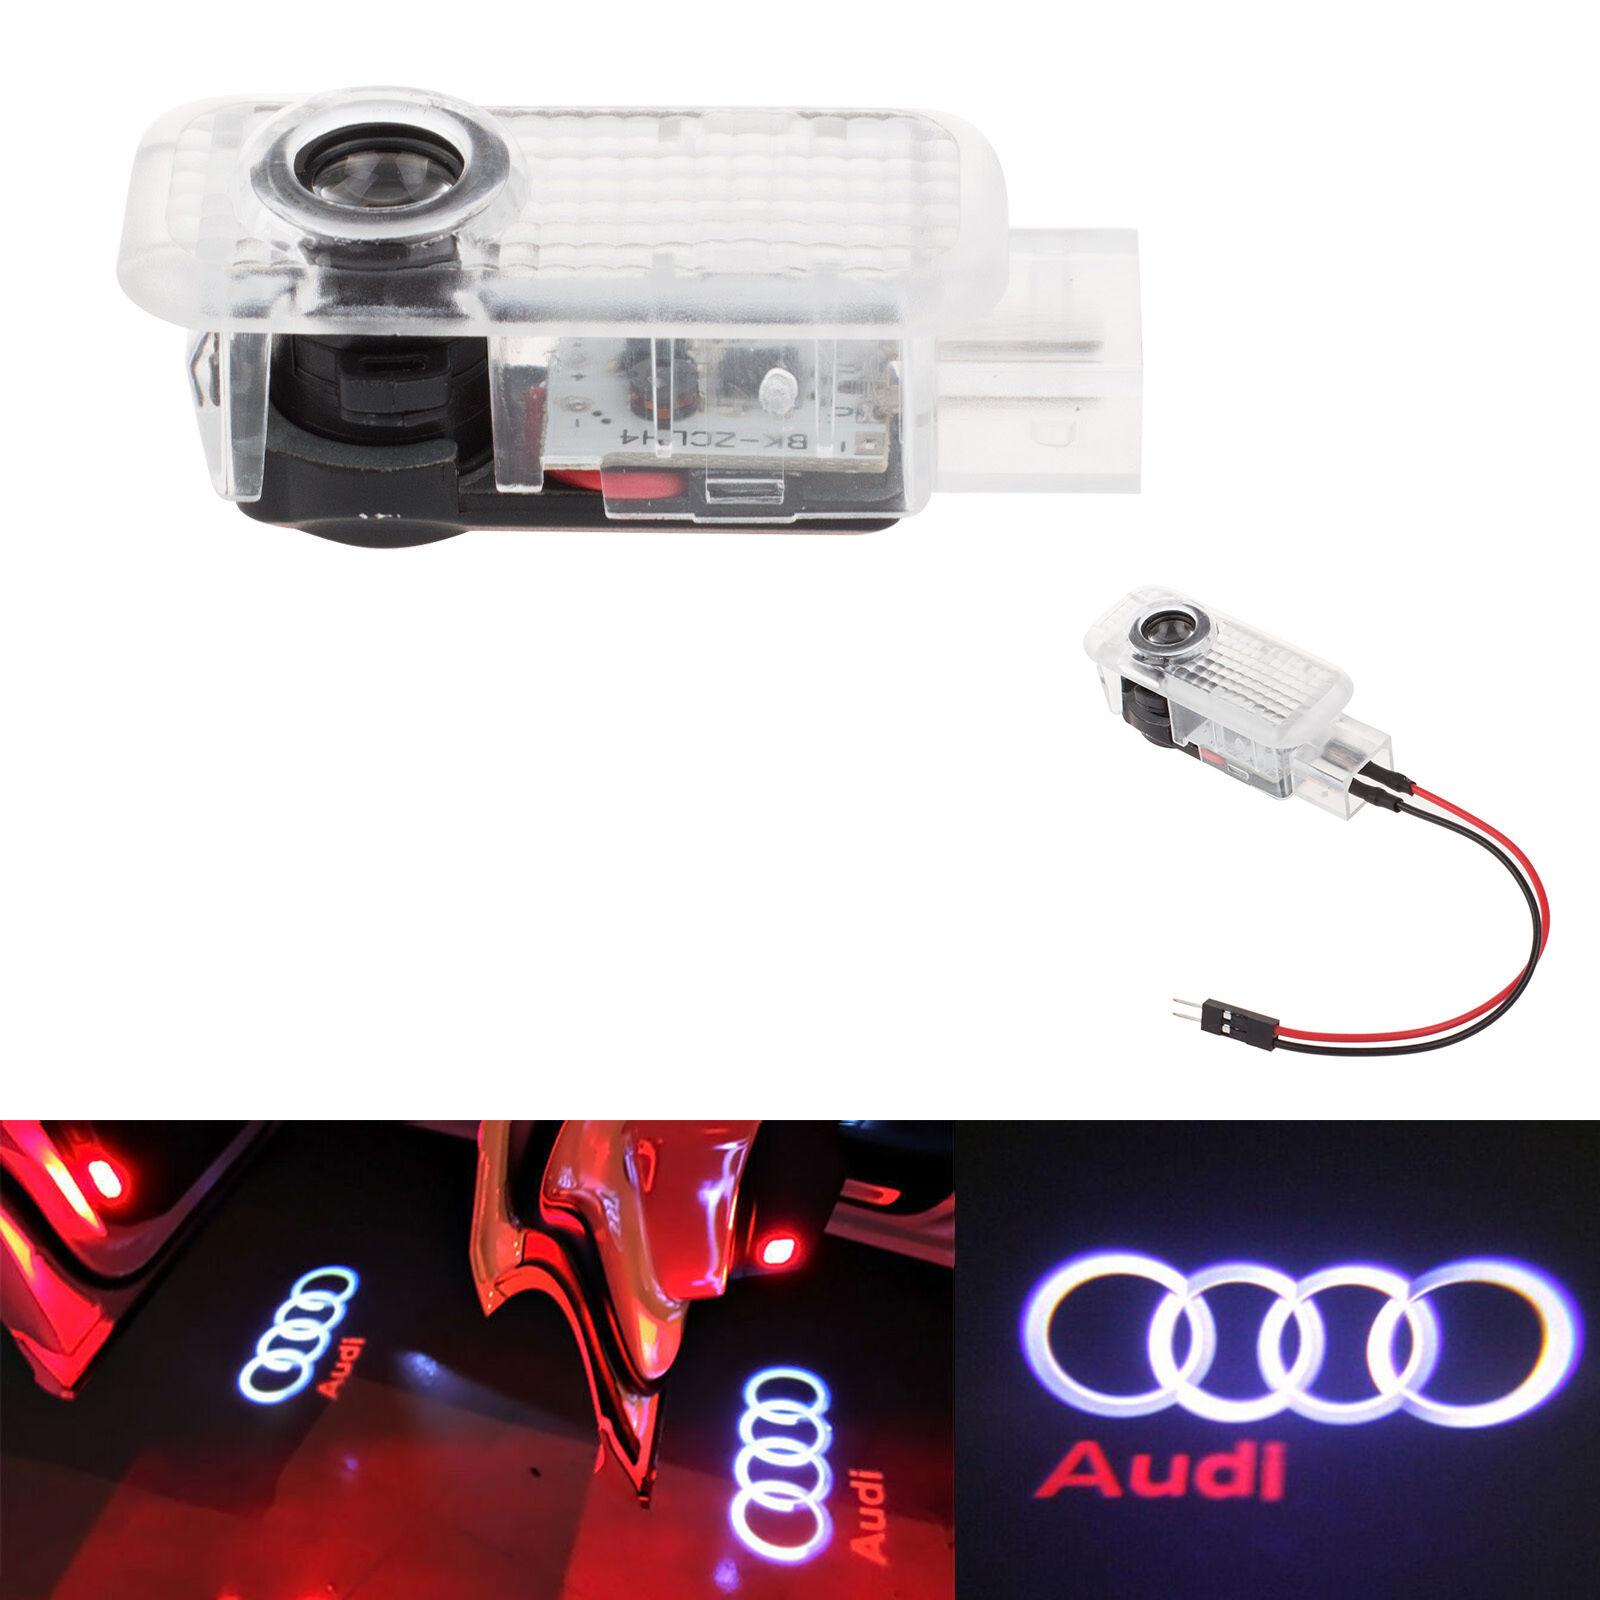 Audi a6 logo light bulb size